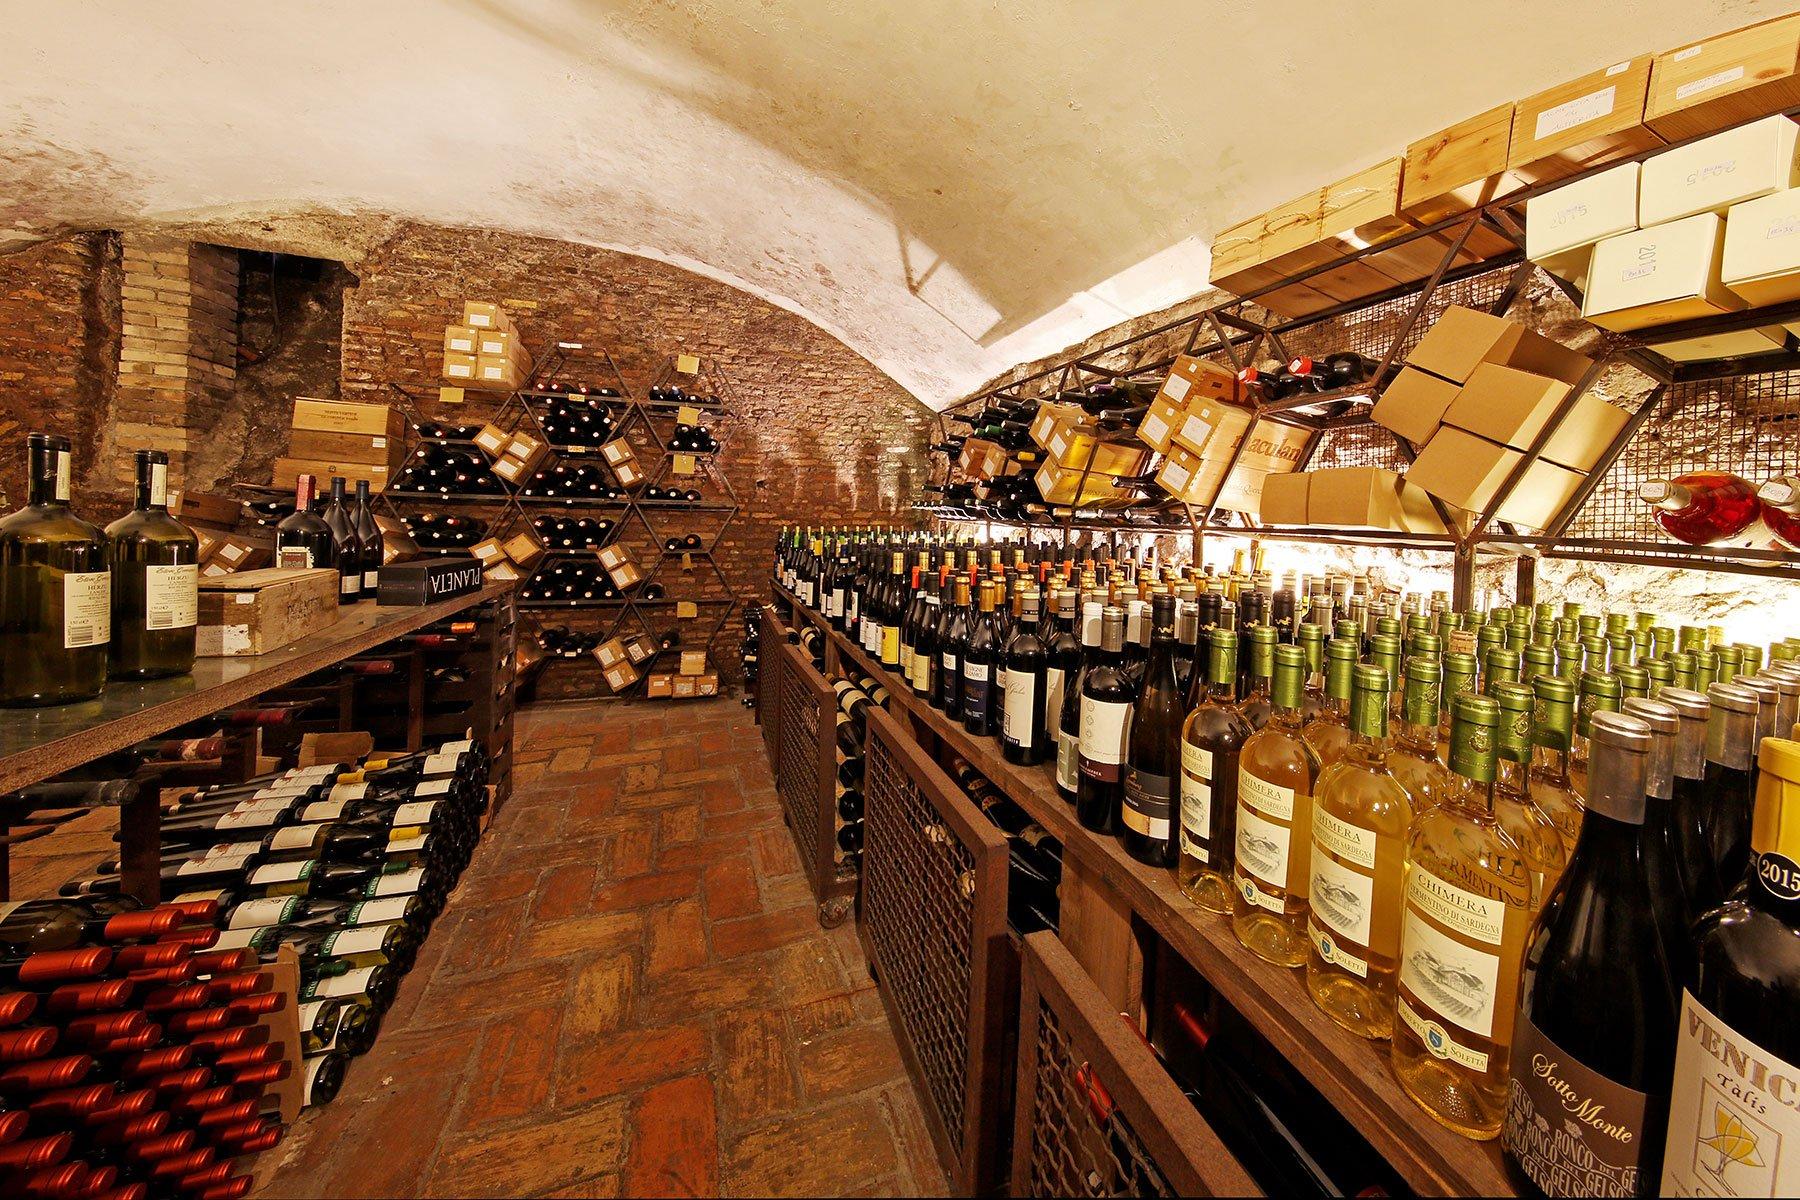 établissement vinicole enoteca ferrara roma trastevere